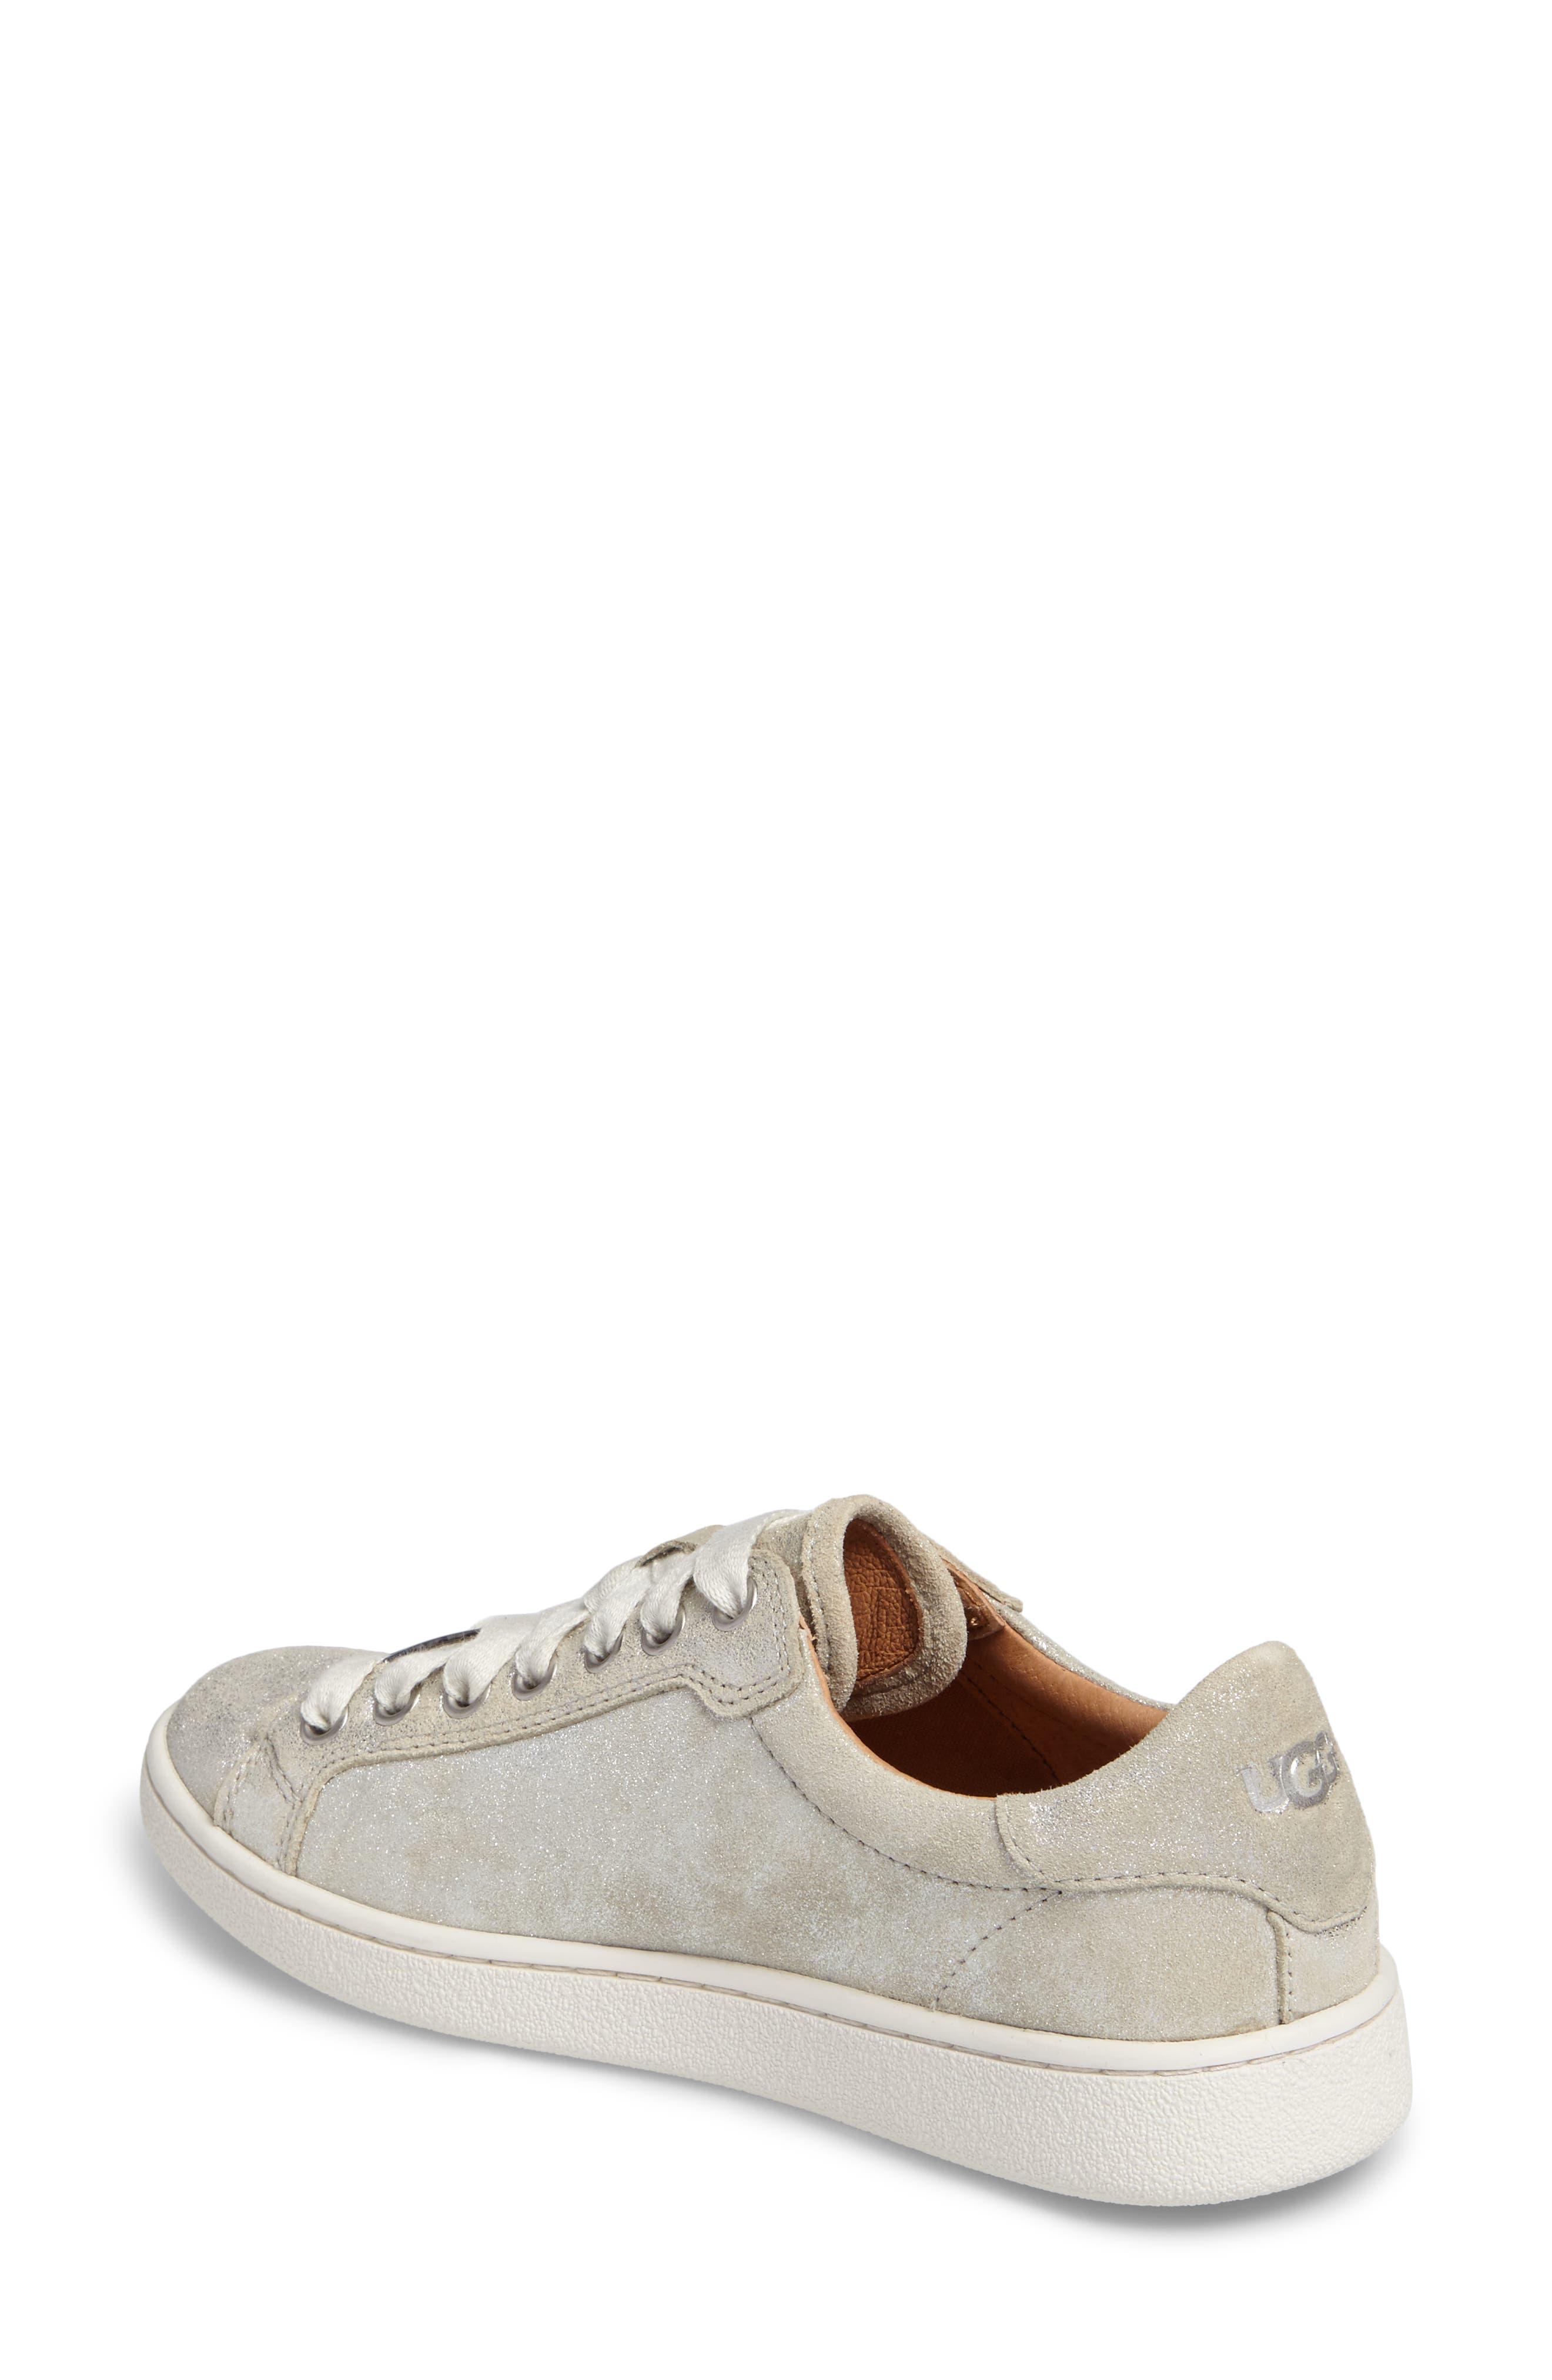 Alternate Image 2  - UGG® Milo Stardust Sneaker (Women)